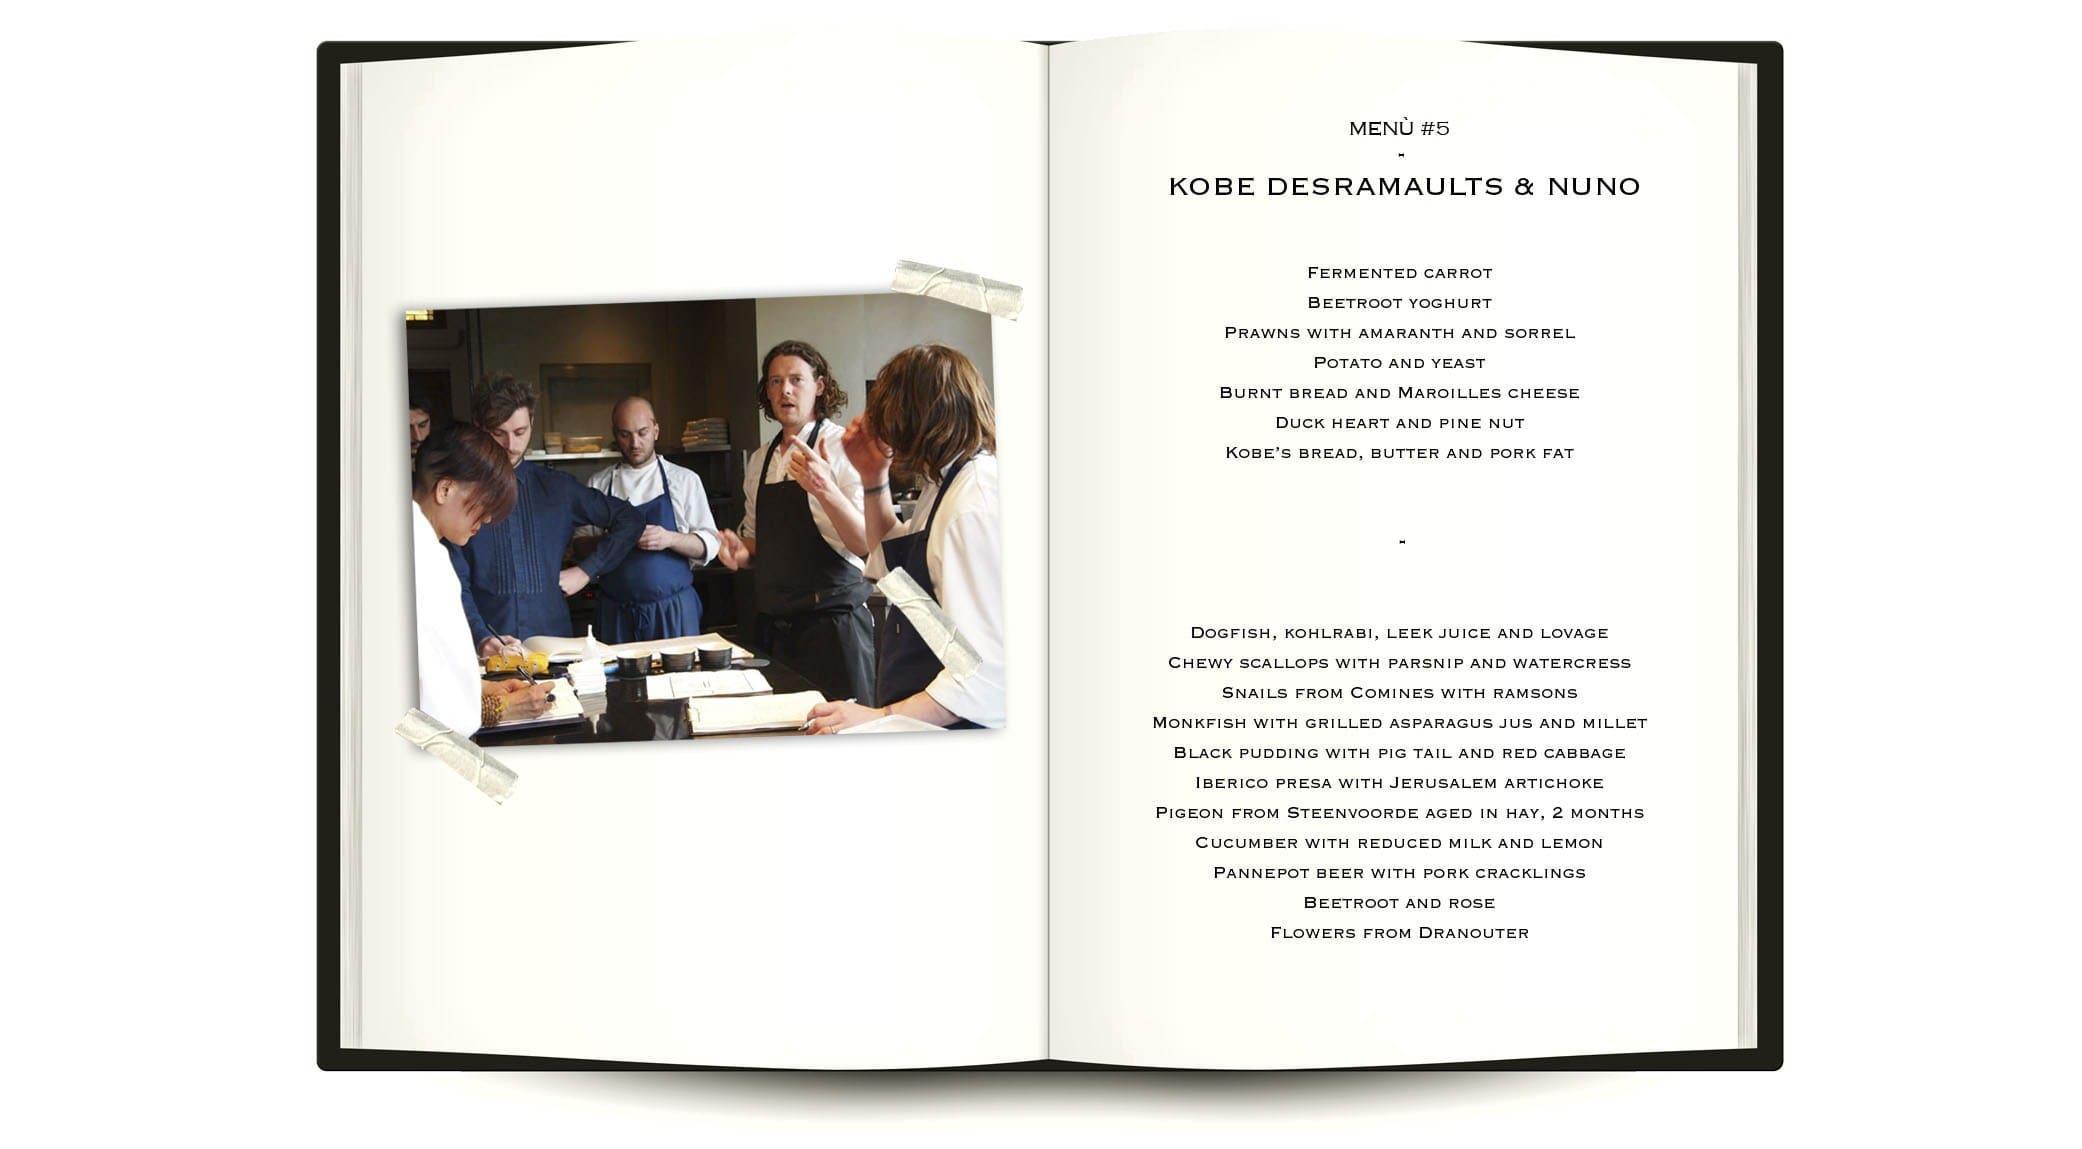 original_menu5-Kobe-Desramaults-nuno.jpg